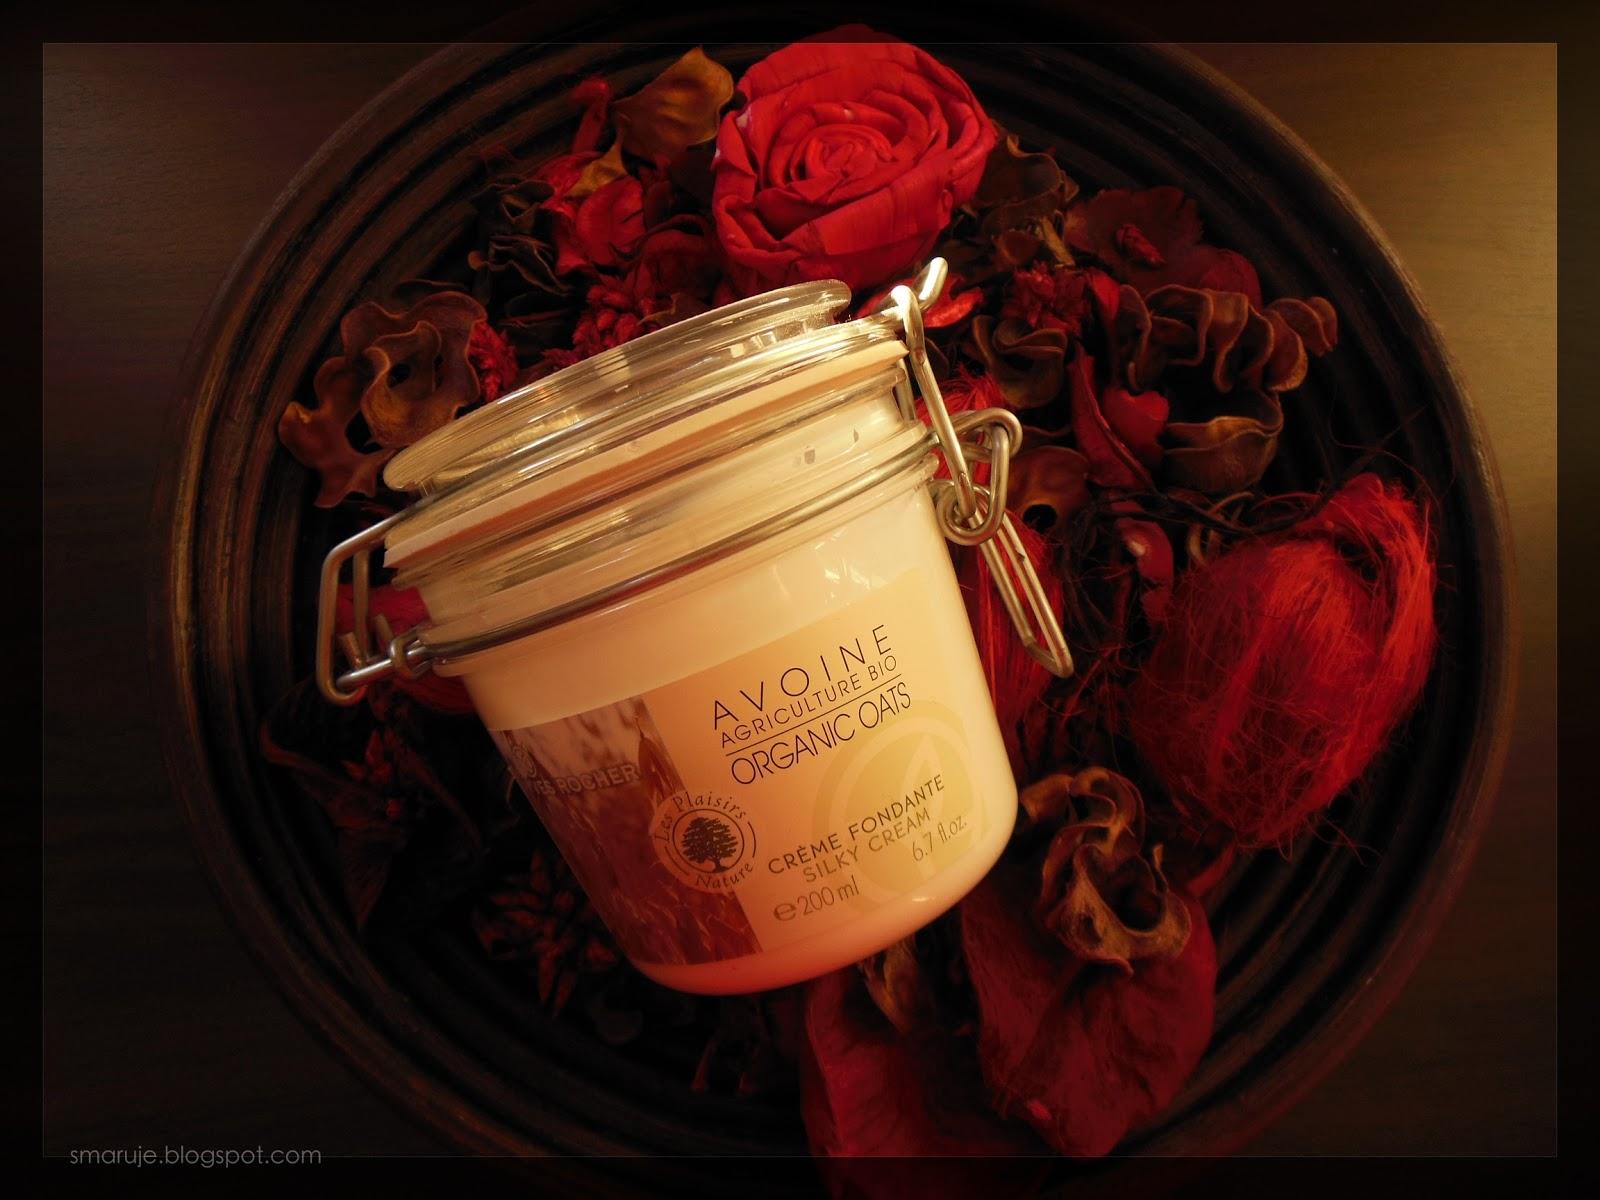 Yves Rocher –Les Plaisirs Nature – Avoine Agriculture Bio Organic Oats, czyli mydlany balsam w rozkosznym słoju